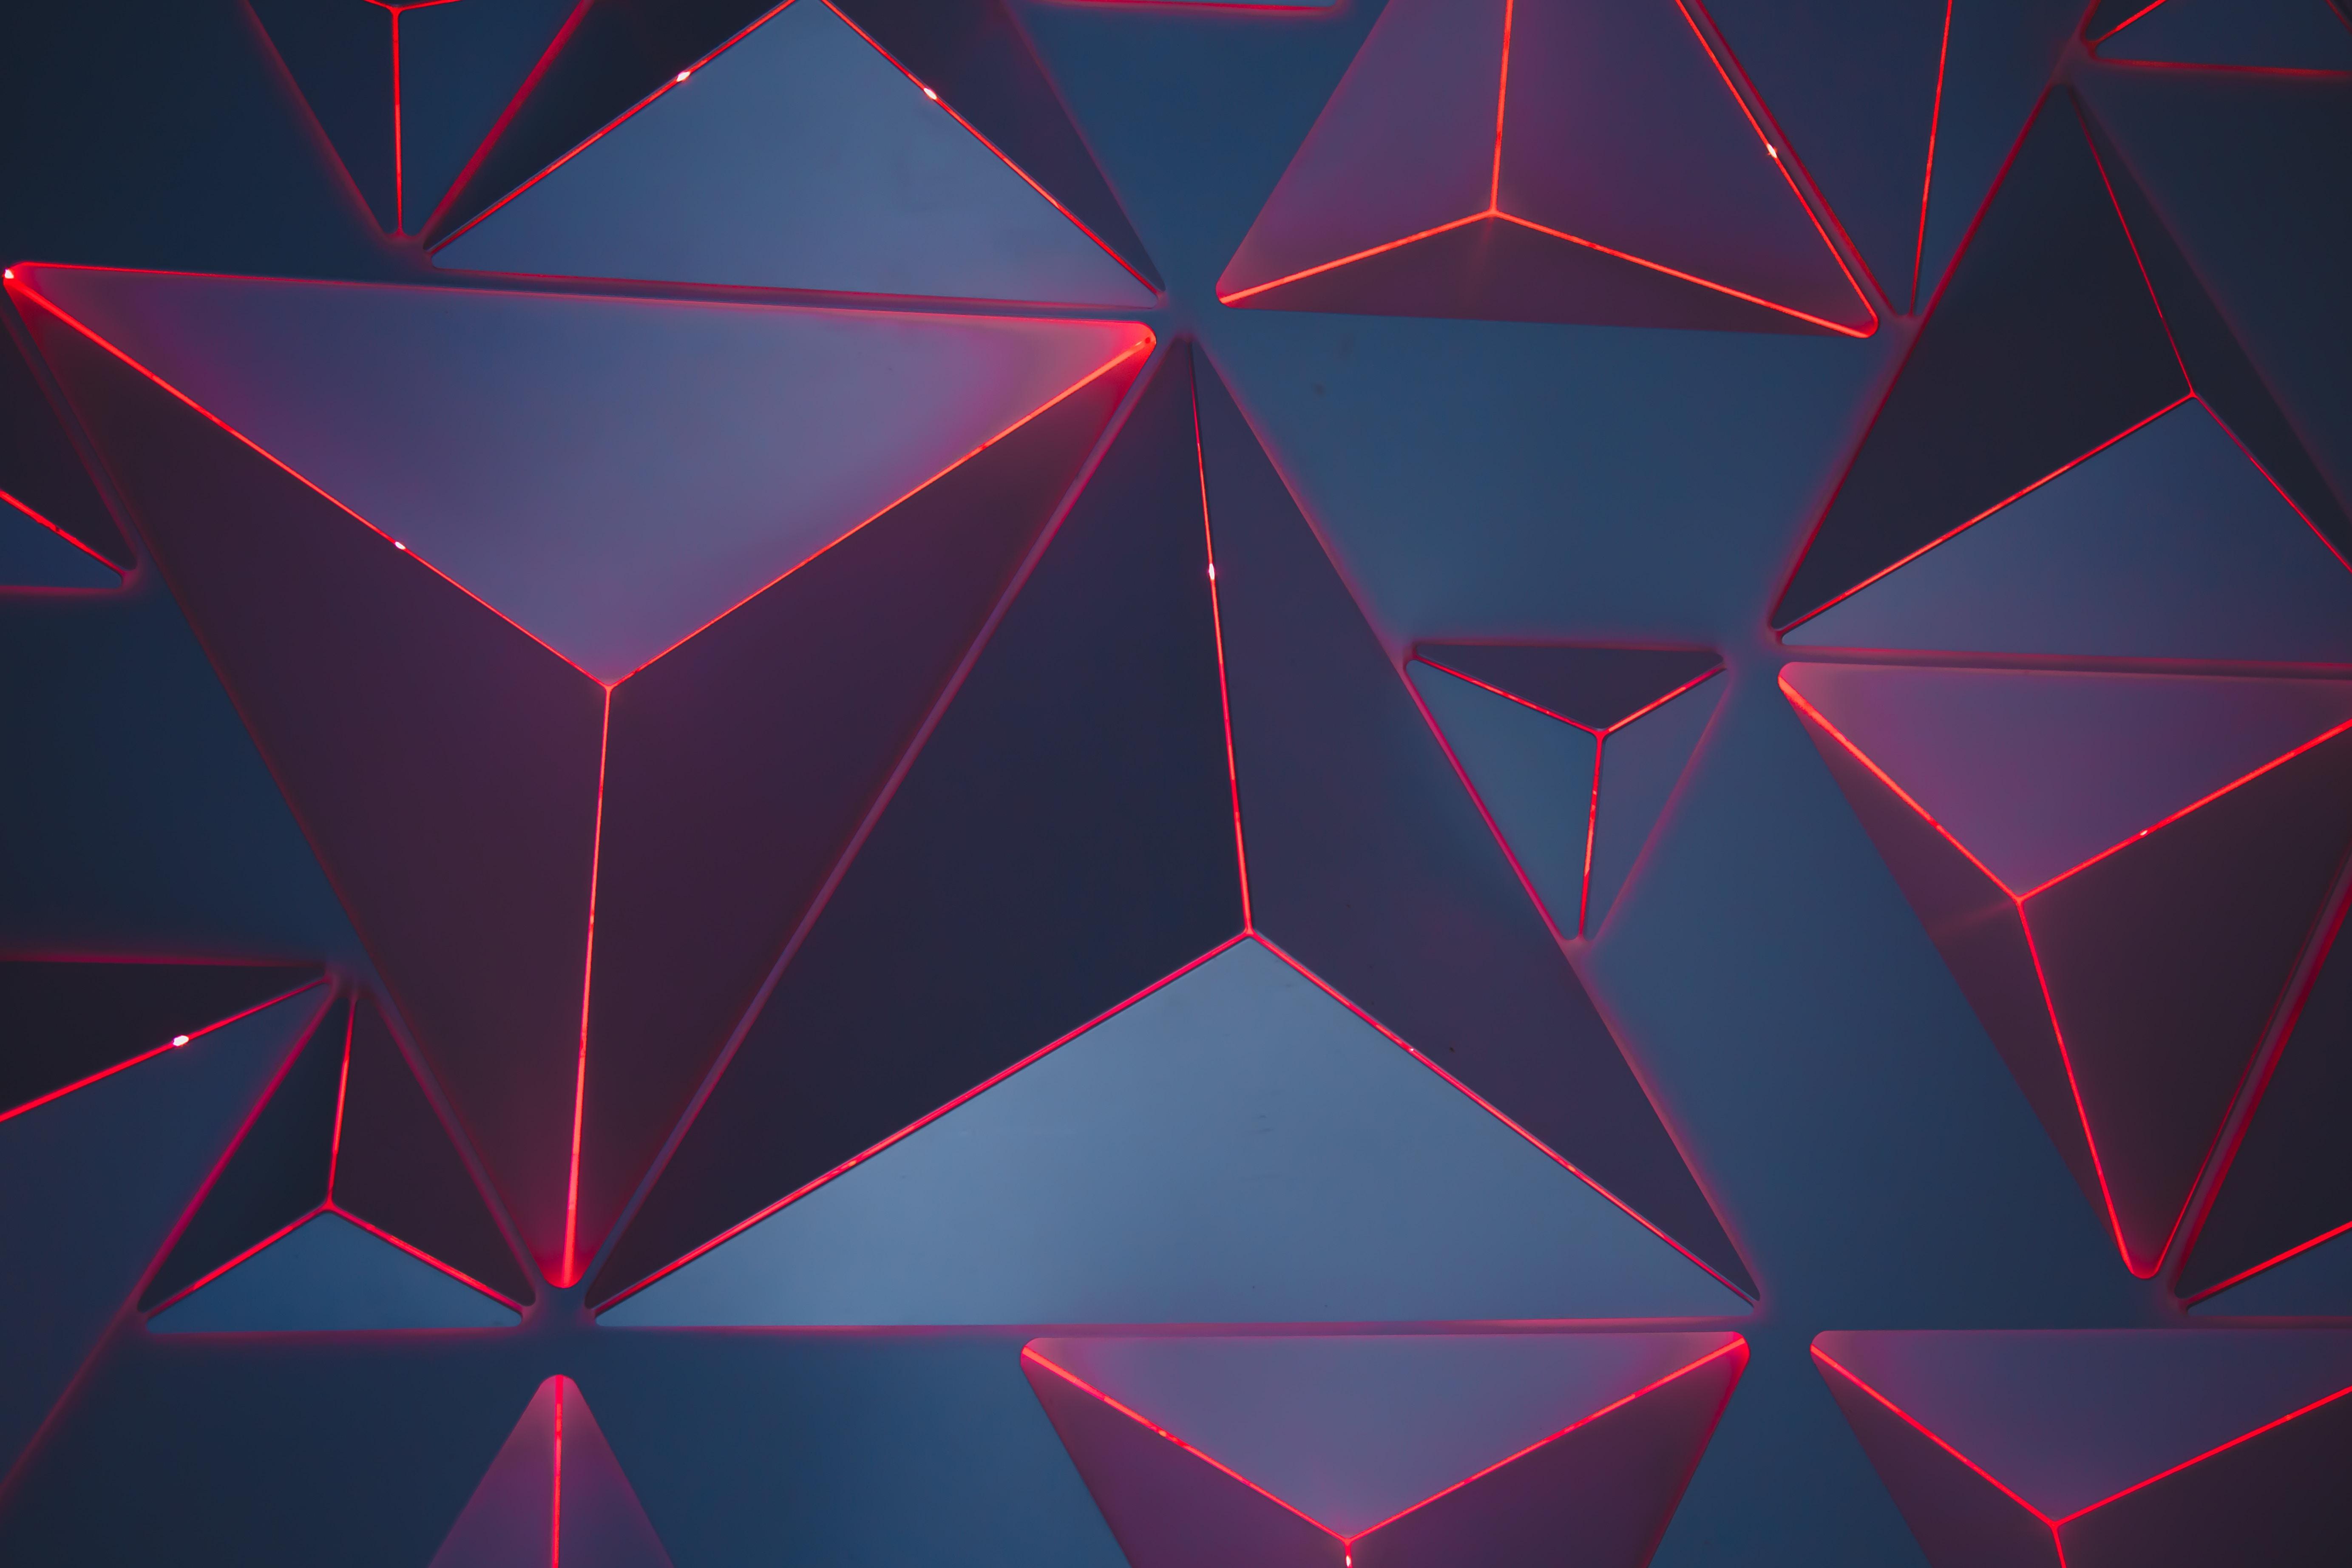 5223416 5533x3689 #geomety, #pyramid, #pink, #wallpaper, #neon.